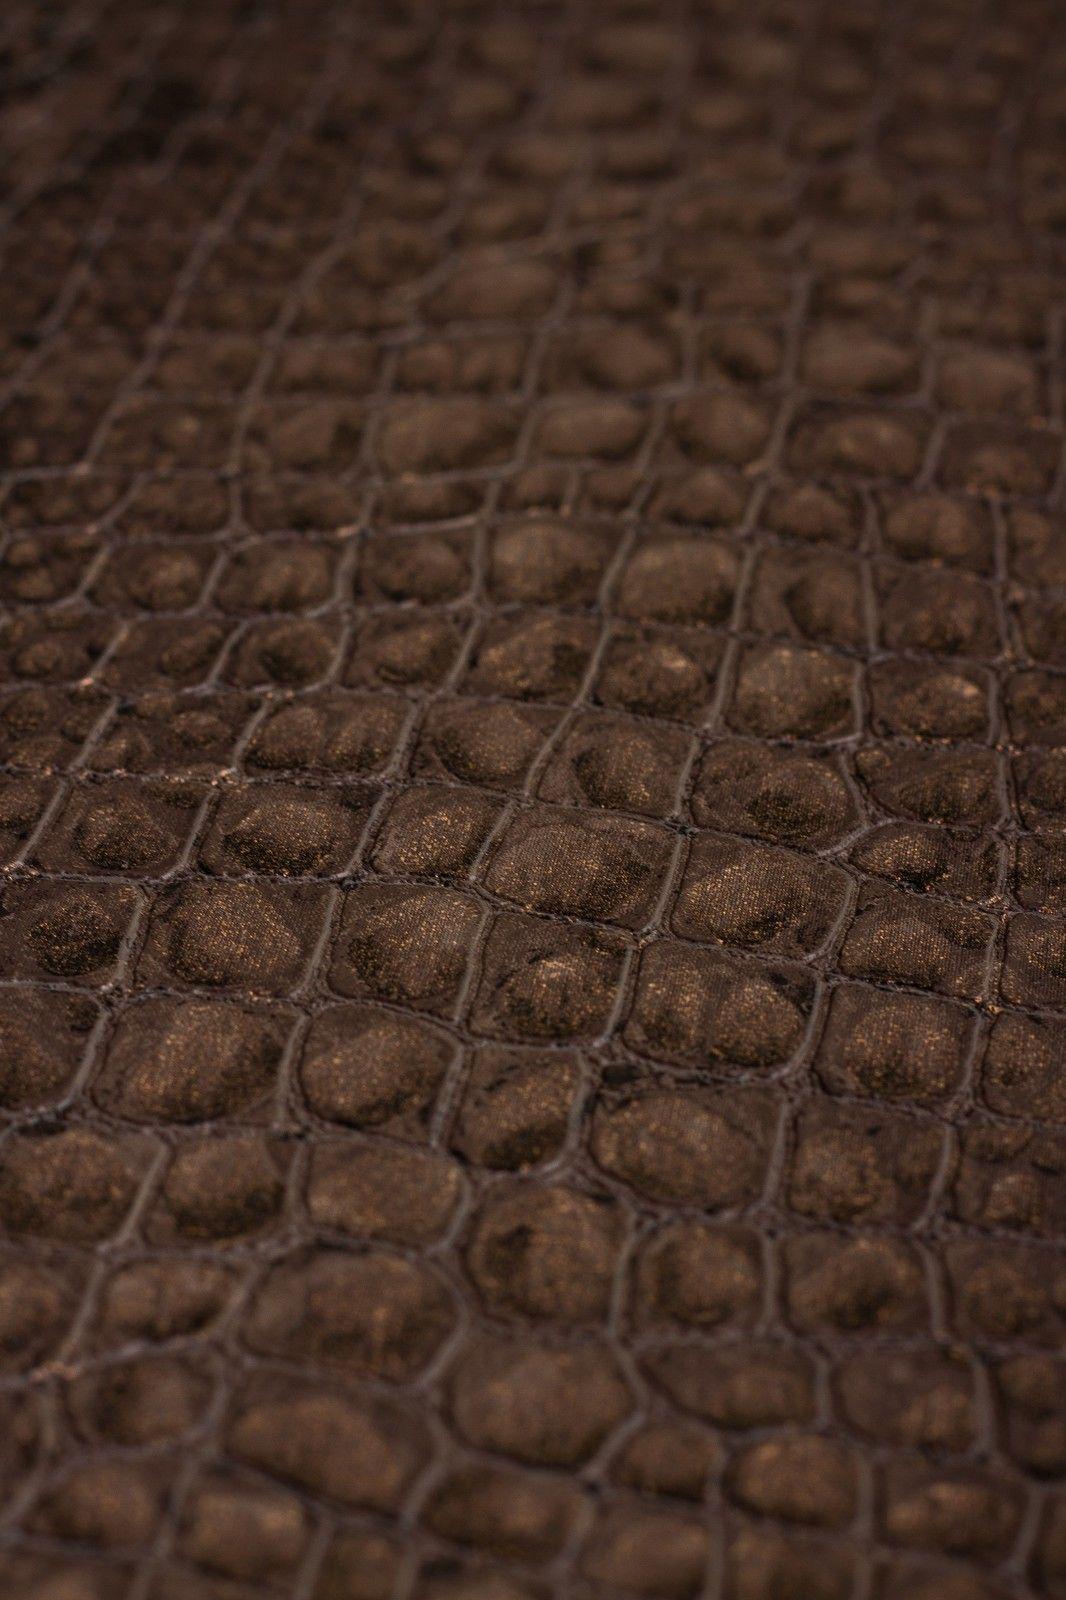 Vlies tapete schlangen leder muster braun bronze graham for Tapete muster braun